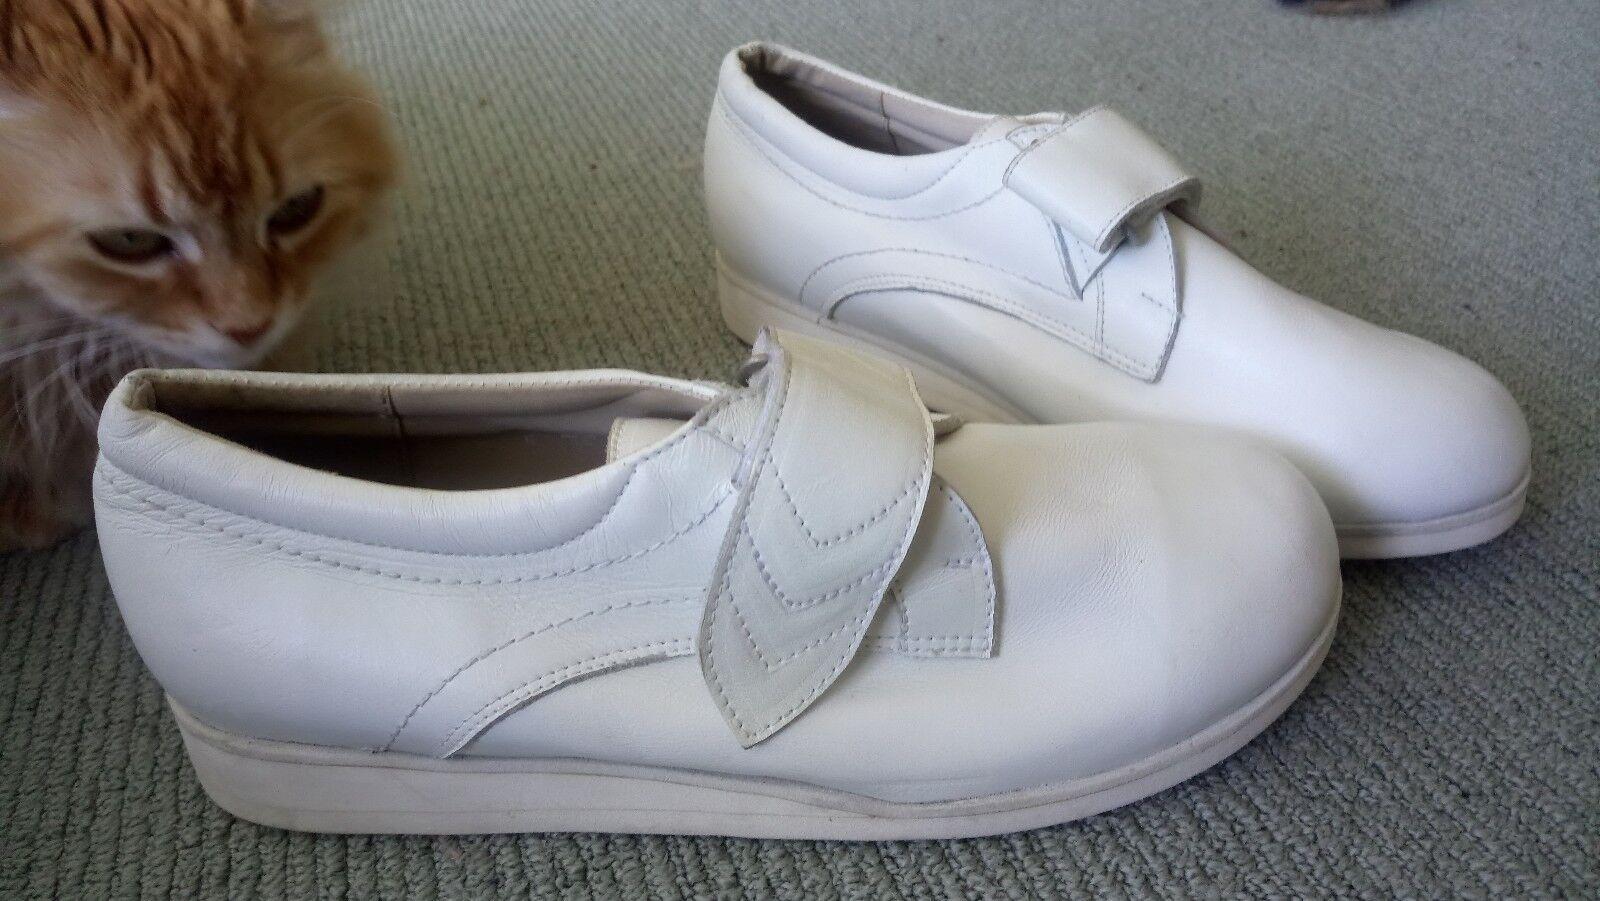 elementi di novità Comfort & Fit Fit Fit bianca Leather walking casual scarpe 8.5 E  garantito